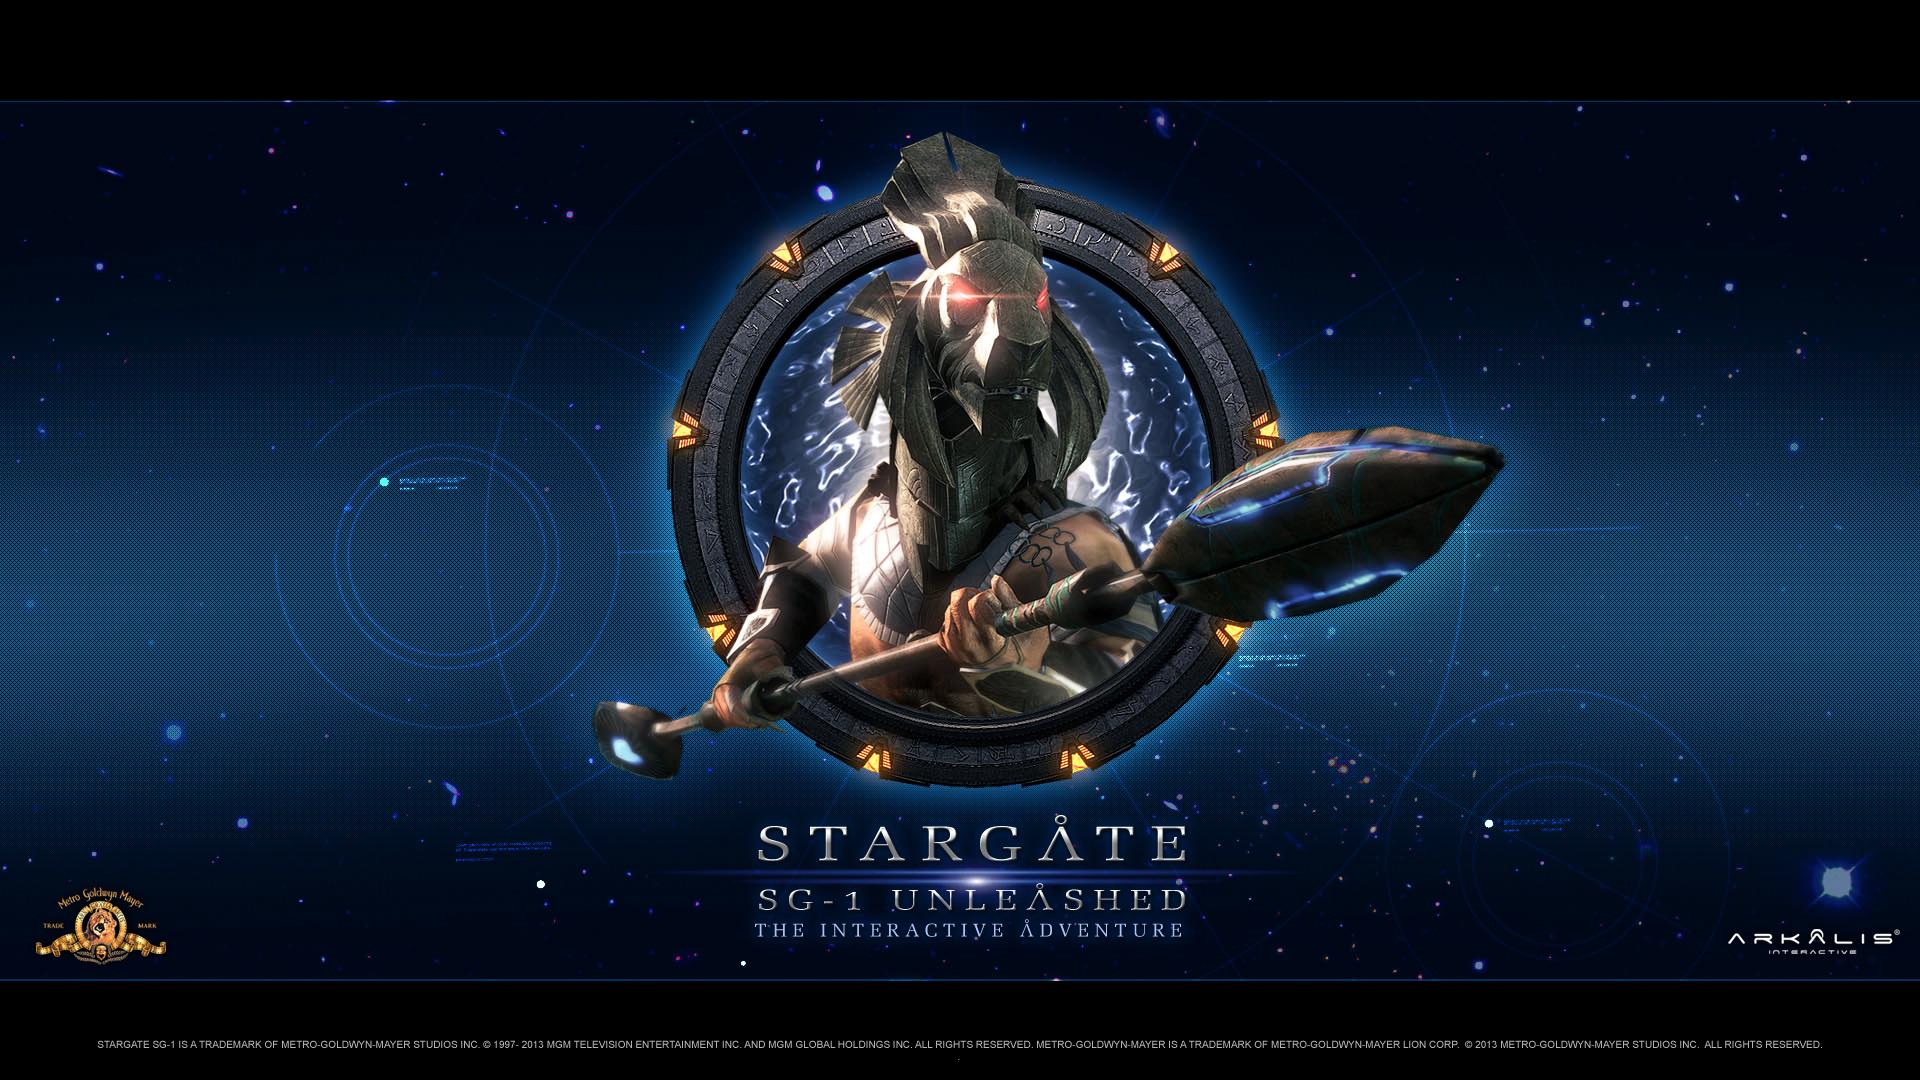 stargate atlantis wallpaper widescreen - photo #26